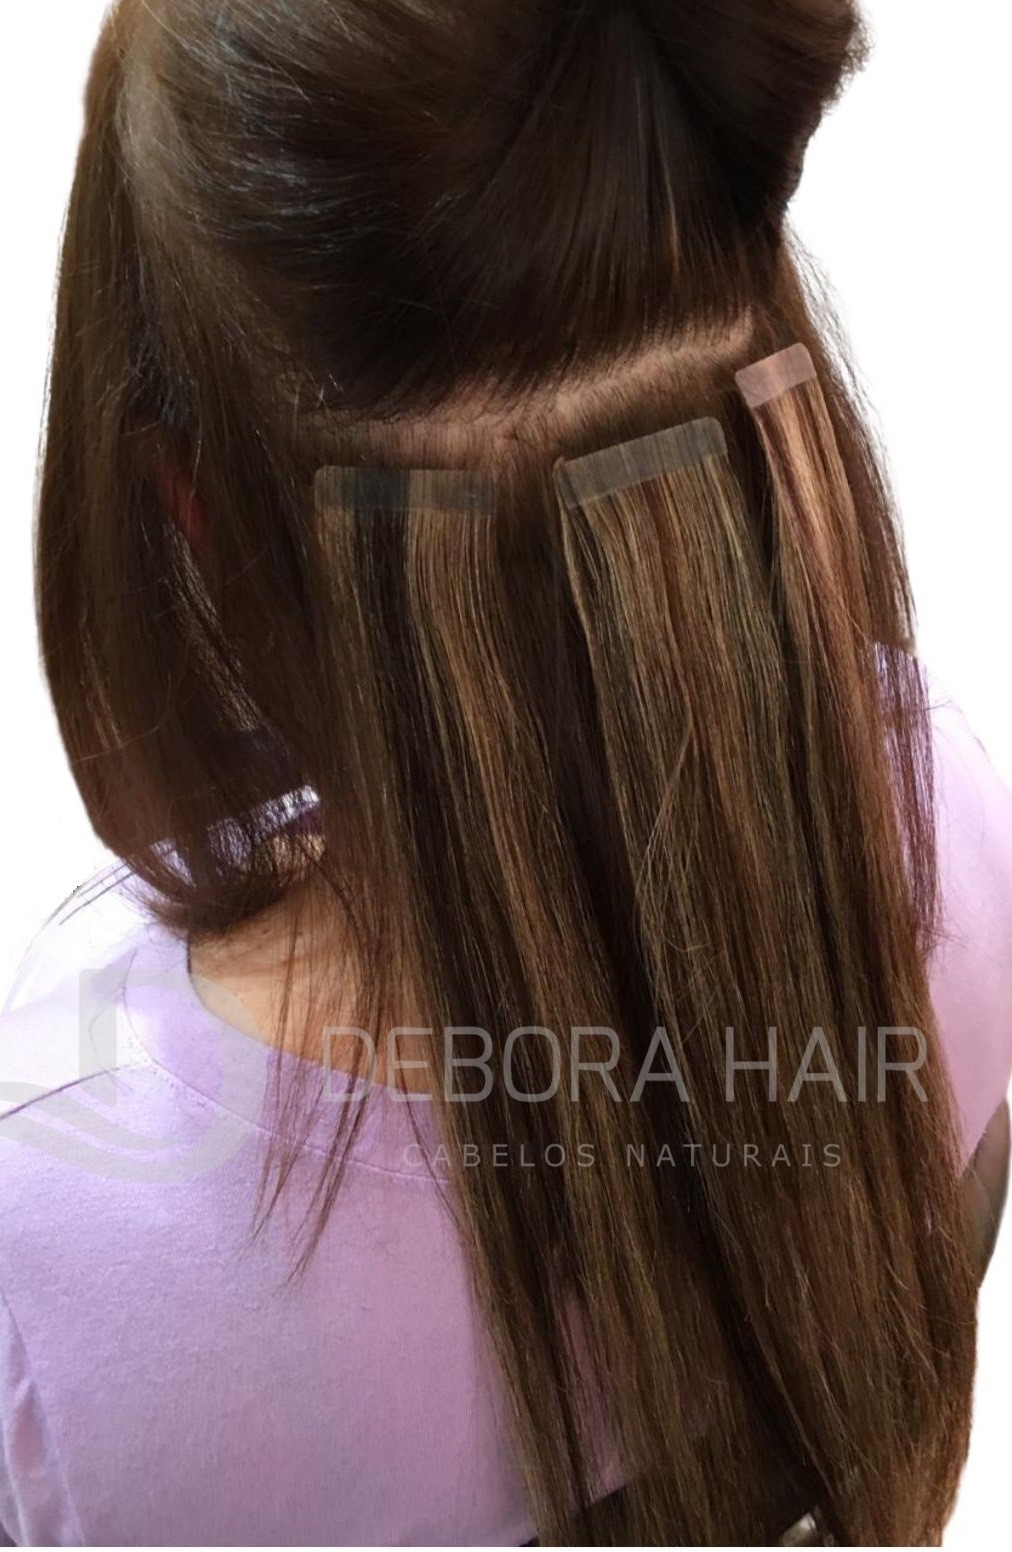 Mega Hair Fita Adesiva 45 cm (SN) N. 1303 20 Peças